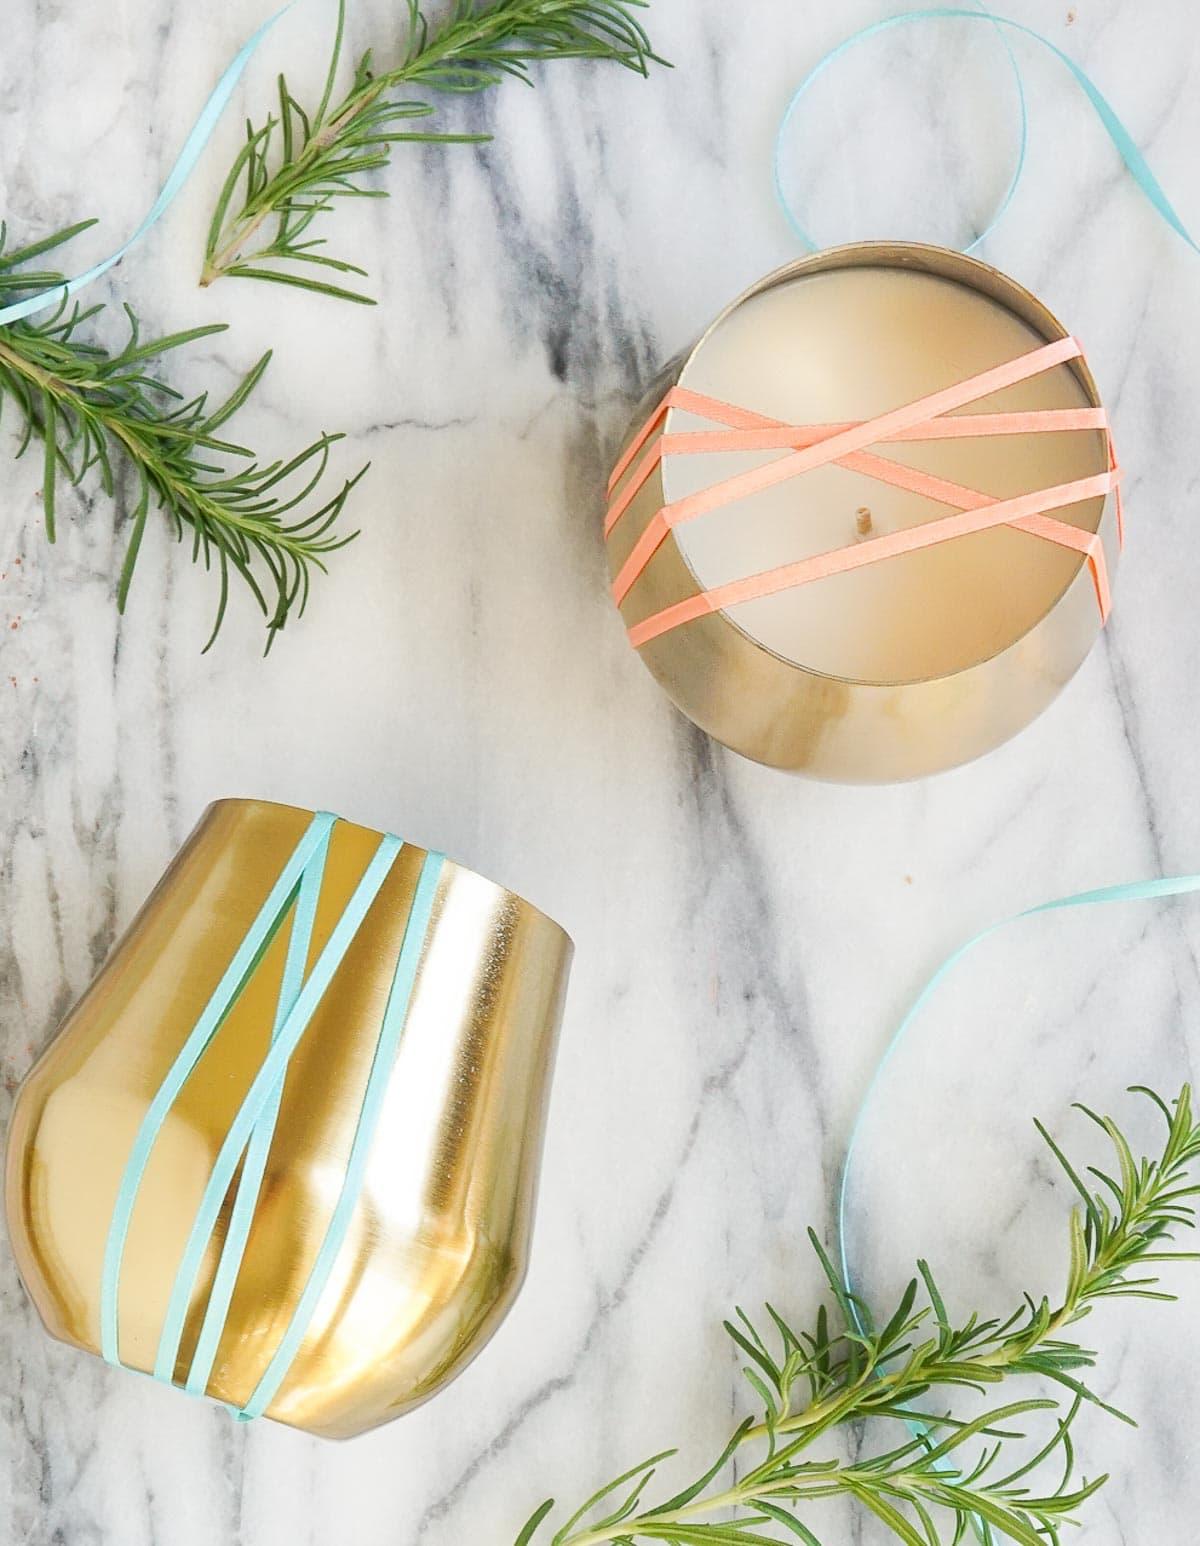 DIY Rosemary and Grapefruit Candle | Sugar & Cloth DIY